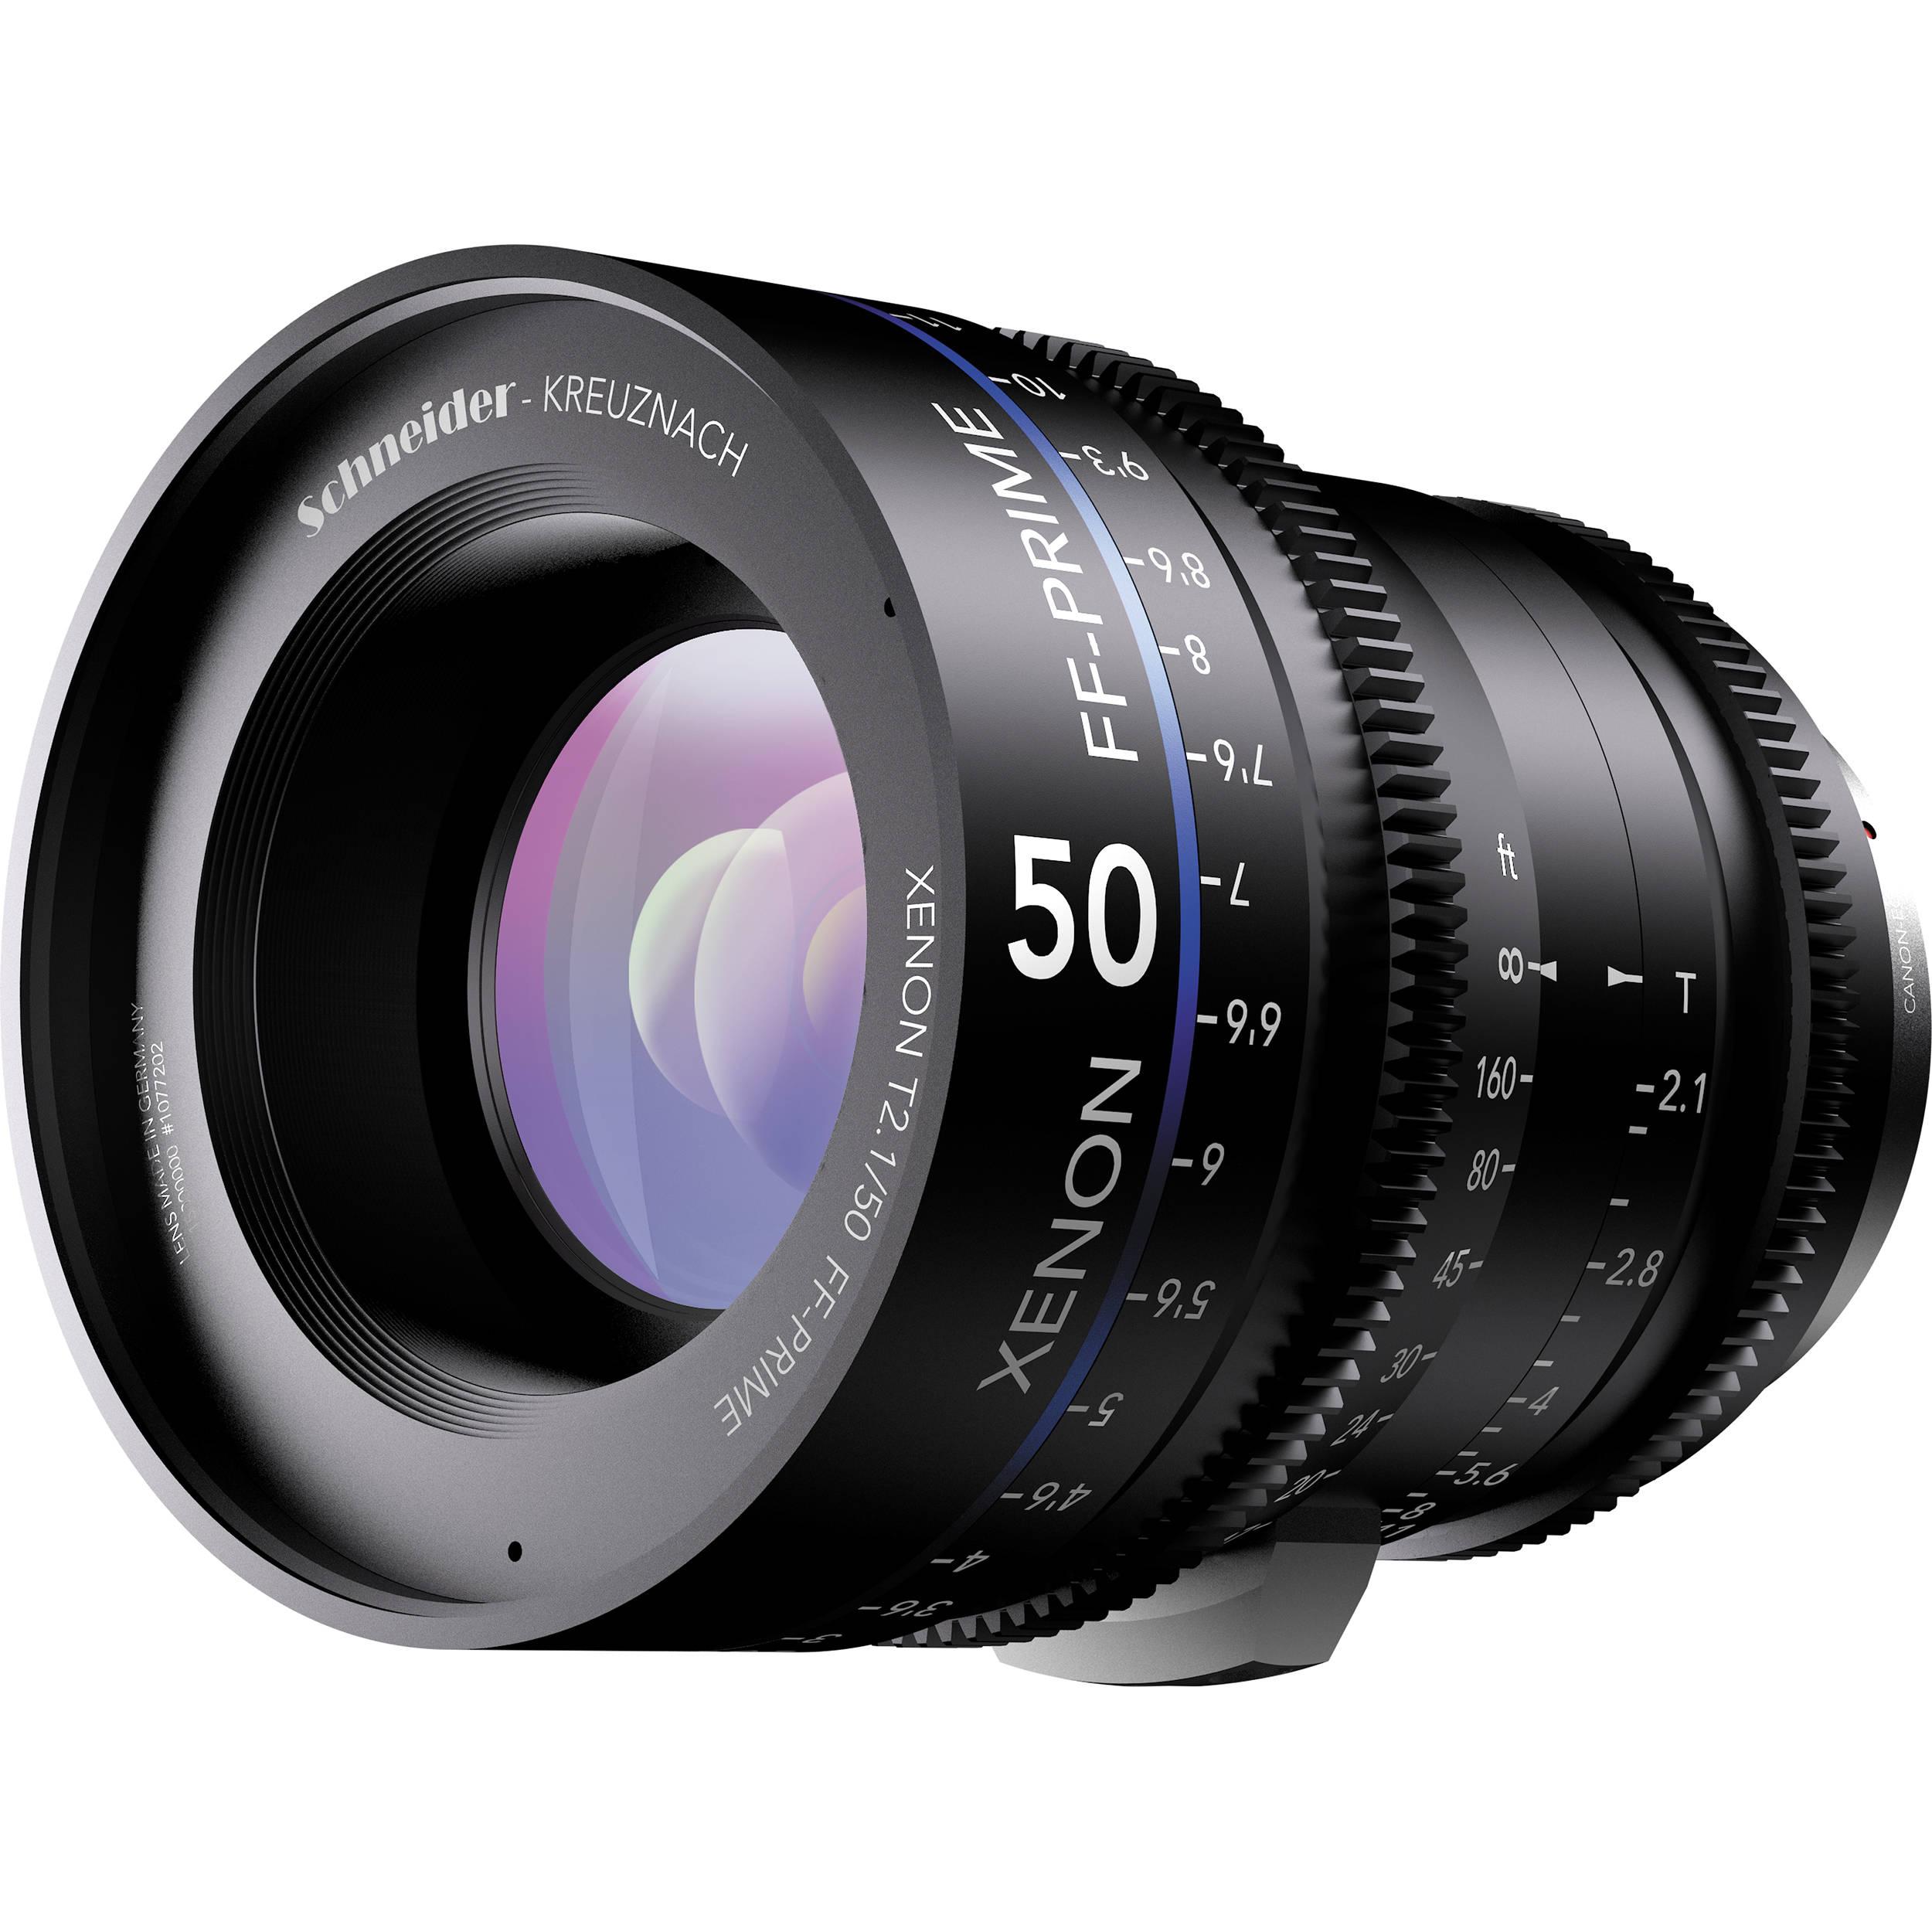 Https C Product 929928 Reg Camera Diagram Labeled Nikon J1 V1 Mirrorless Interchangeable Lens Schneider 09 1085548 Xenon Ff 50mm T2 1 1192716